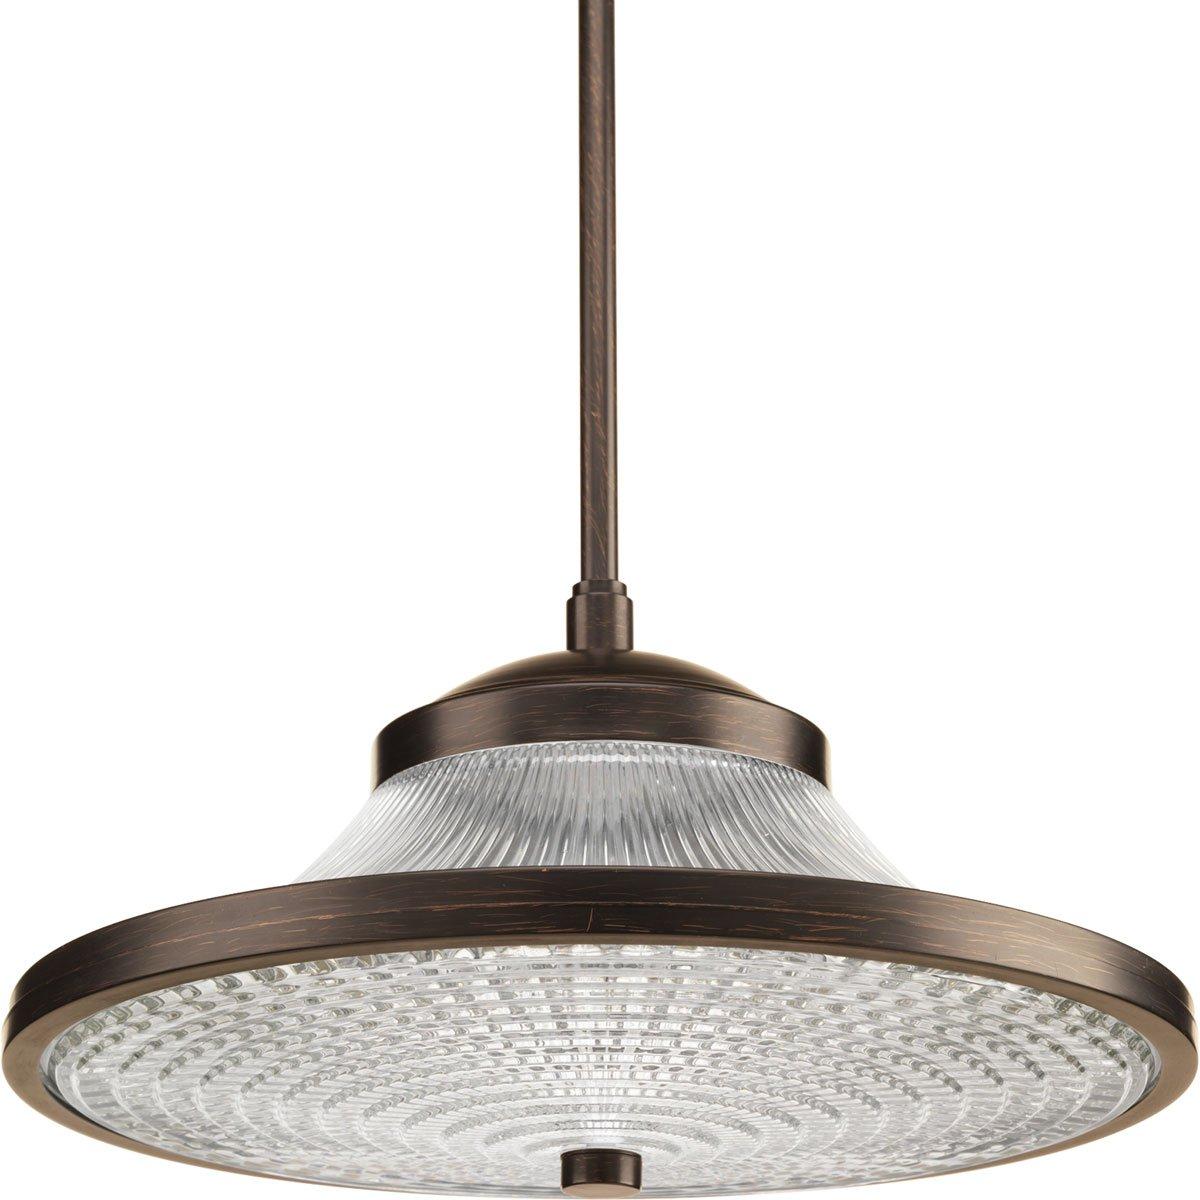 Progress Lighting P5053-7430K9 1 Light LED Pendant with AC Module, 14 by Progress Lighting B00SGCS4LQ